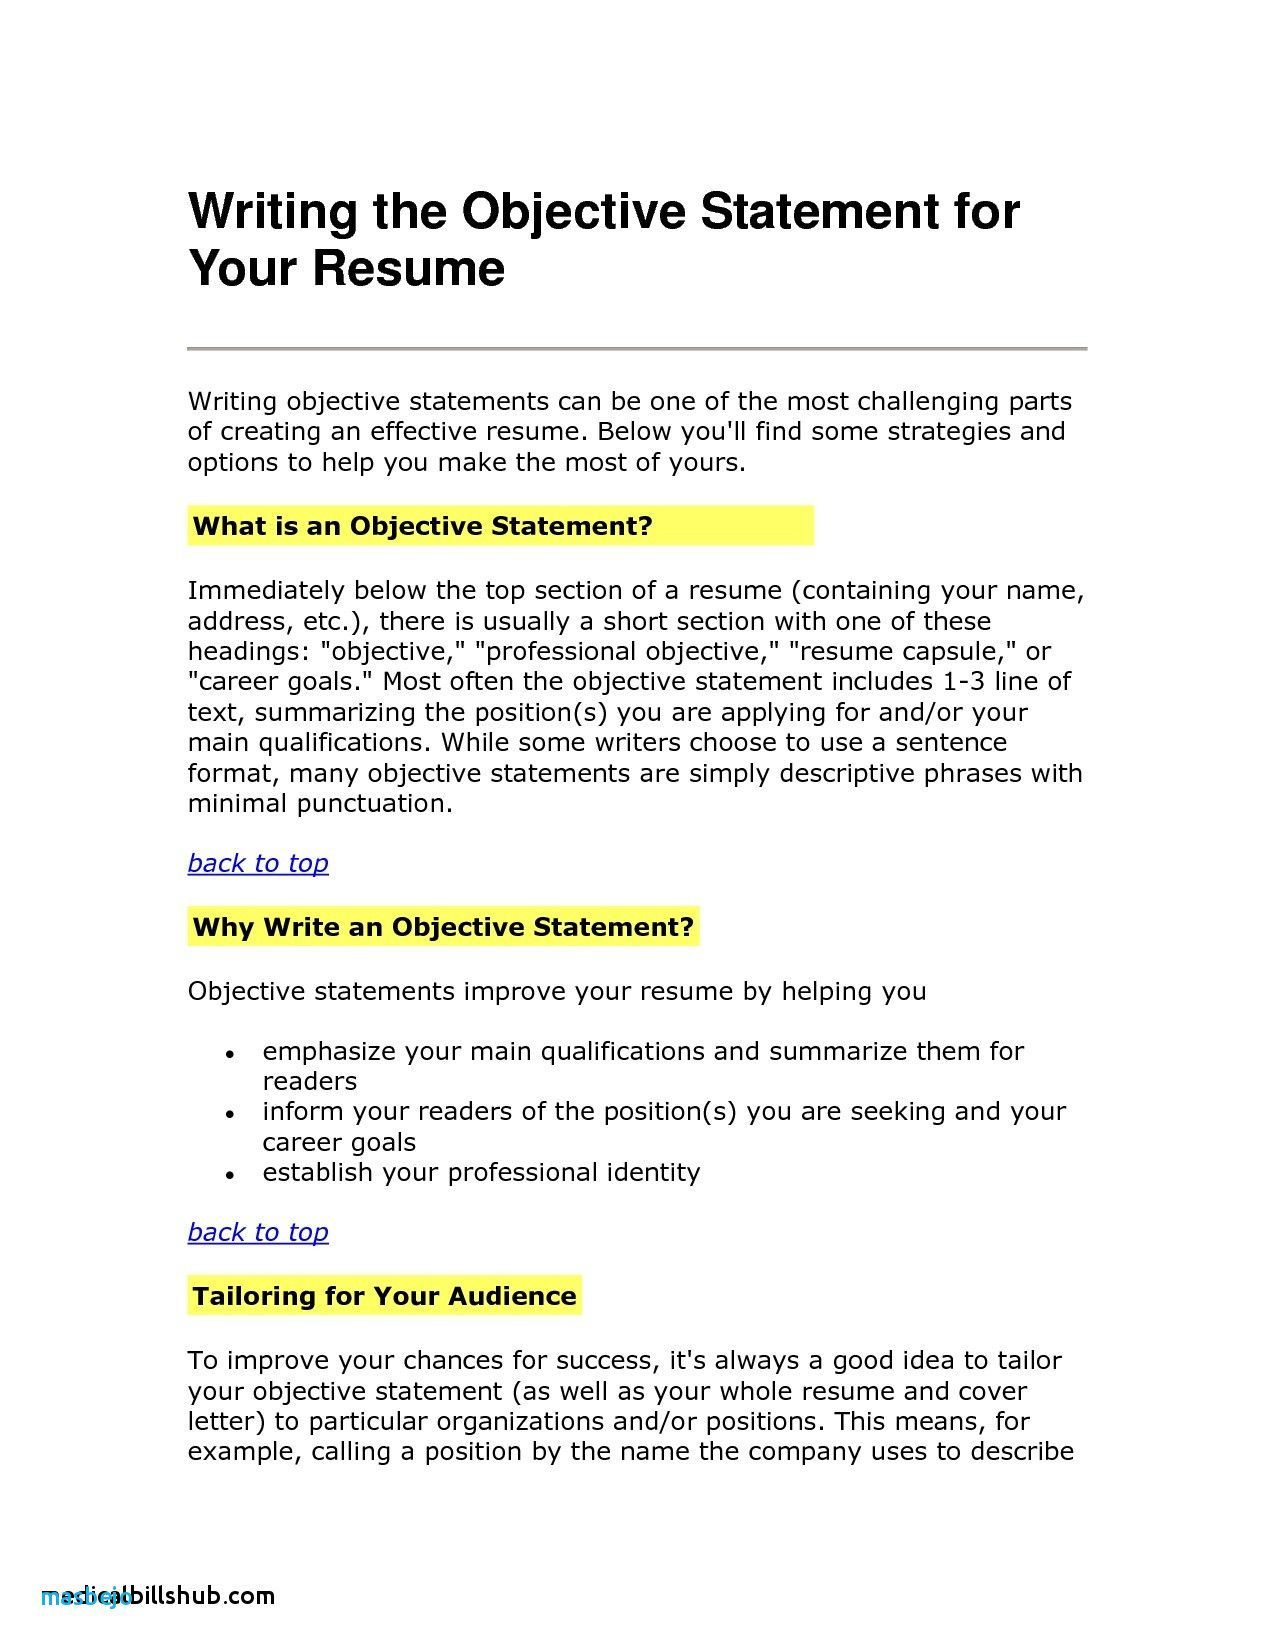 Toothsome Resume Examples Interview Questions Careerfairdusty Career Advice Books Careerwomen Resumelandscape Riwayat Hidup Proposal Surat